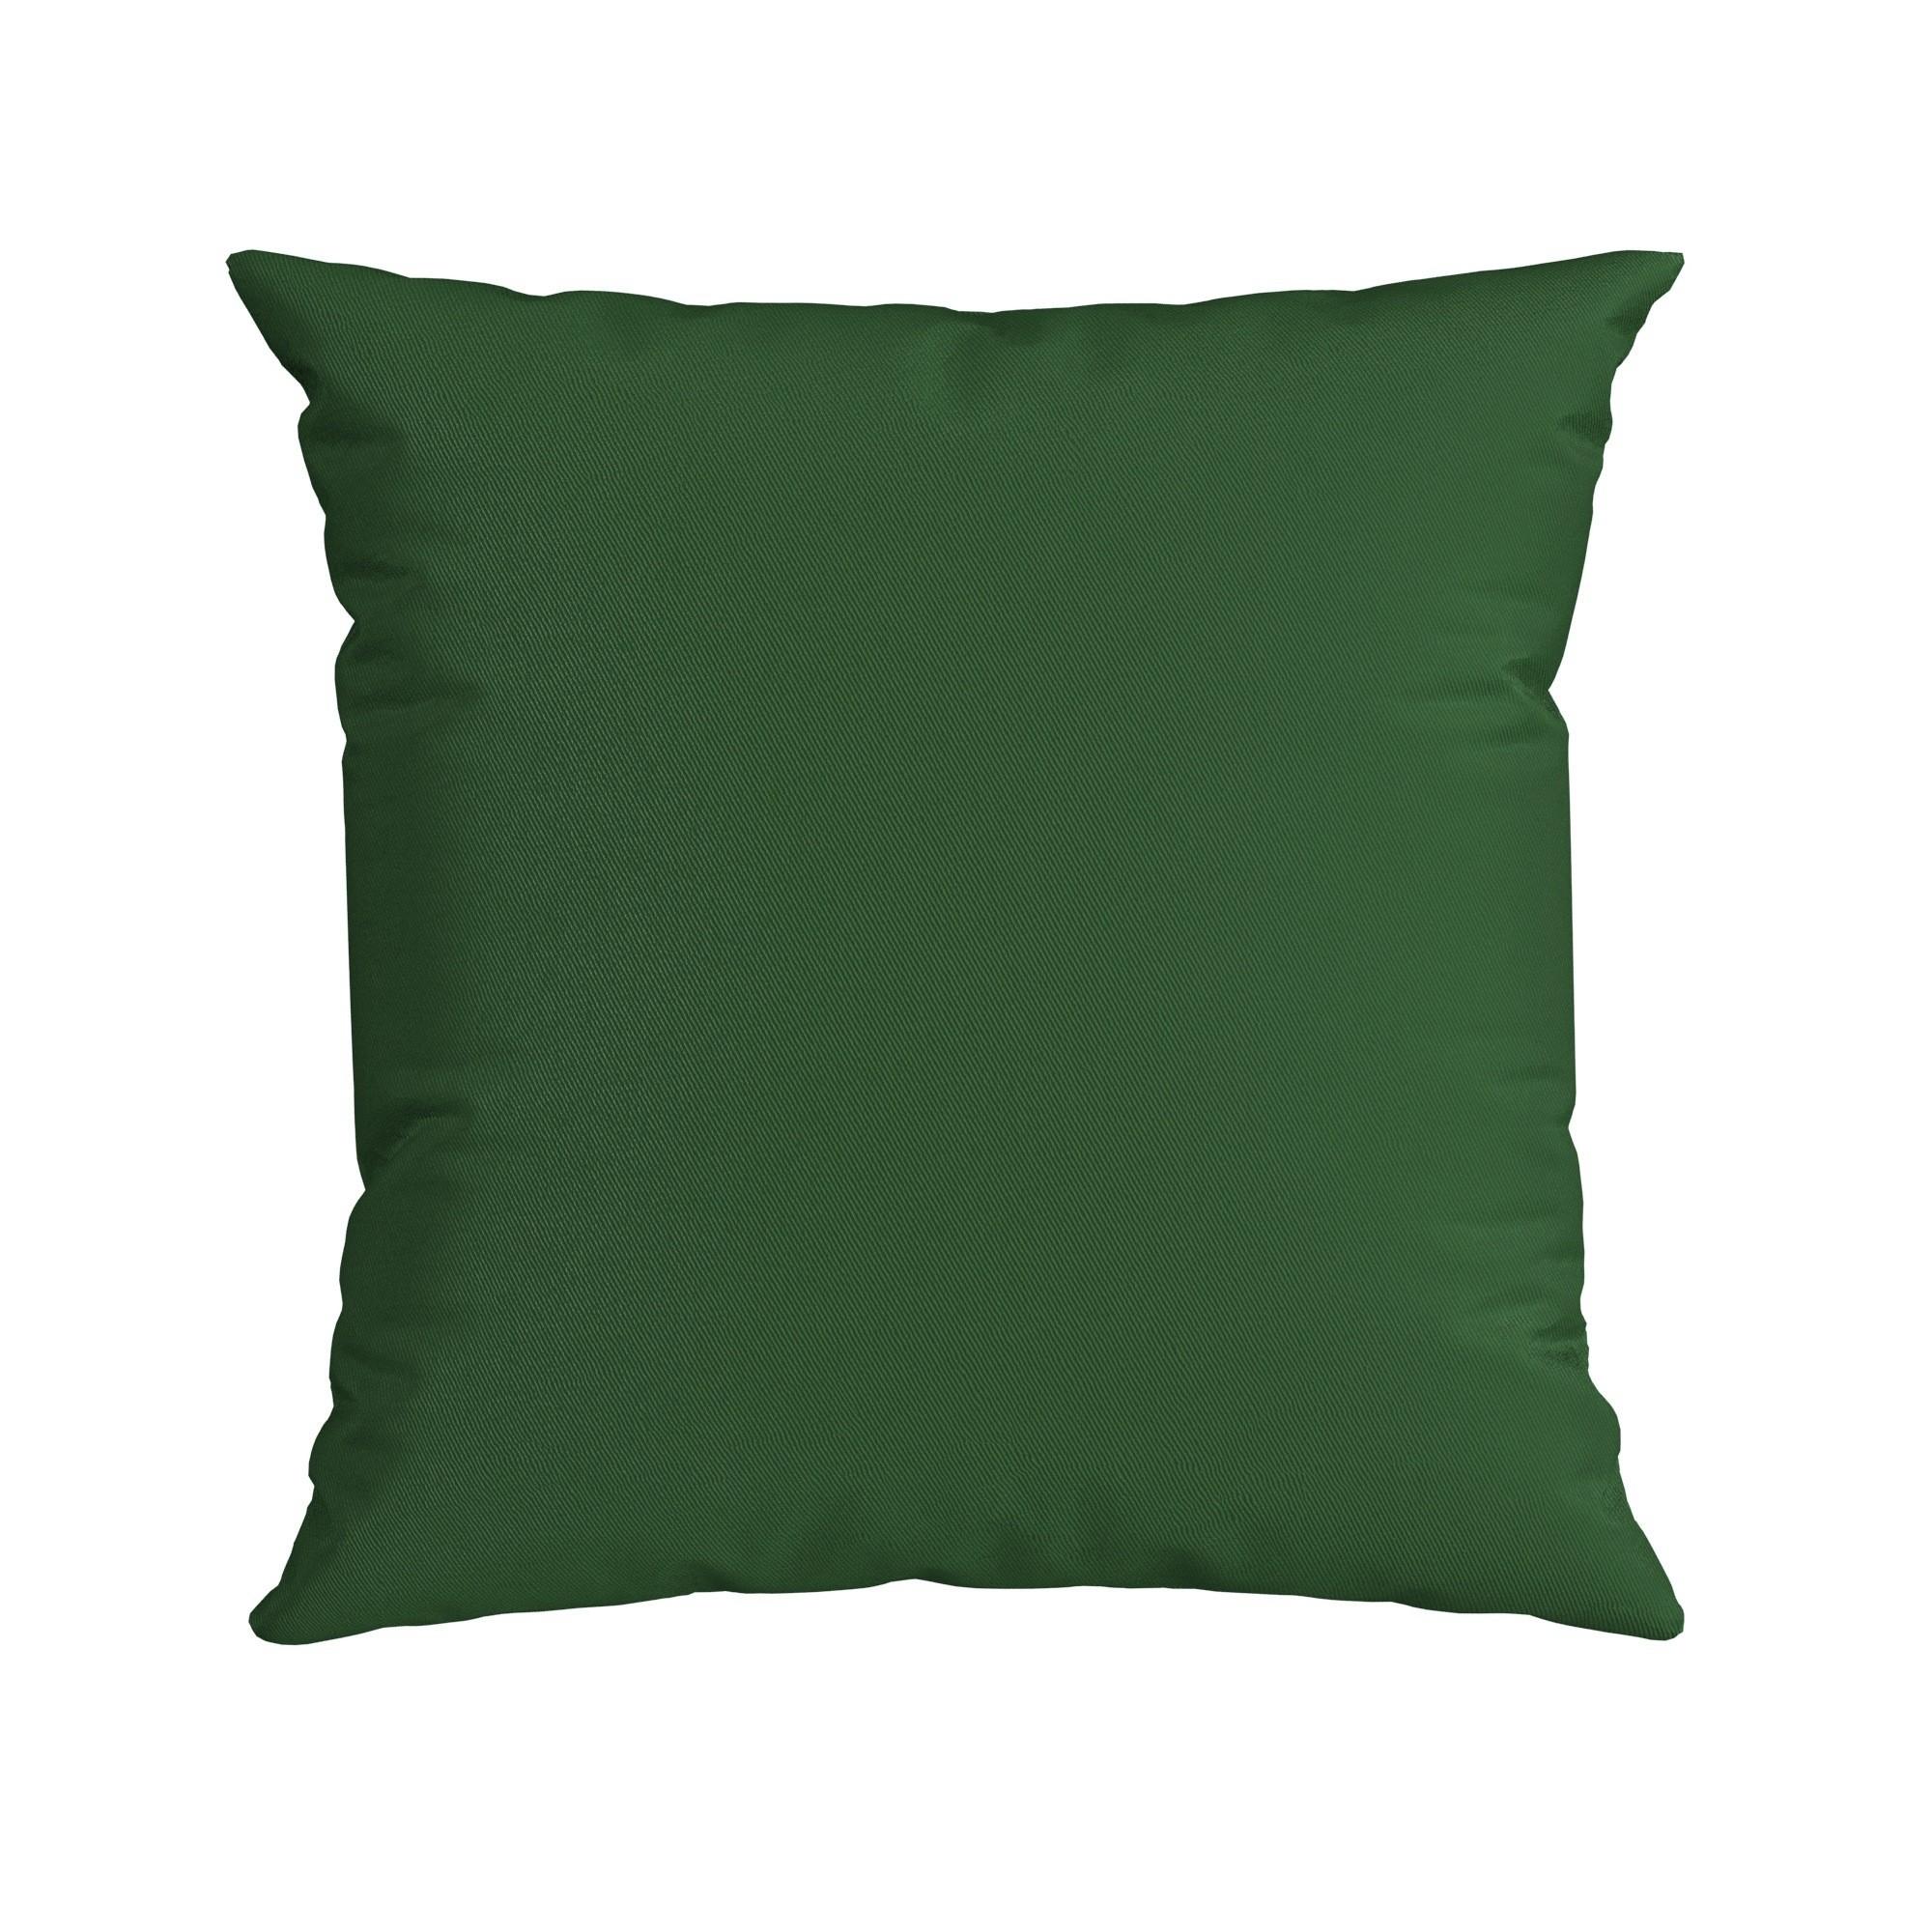 Almofada Ludic 43x43cm Verde Escuro - Belchior